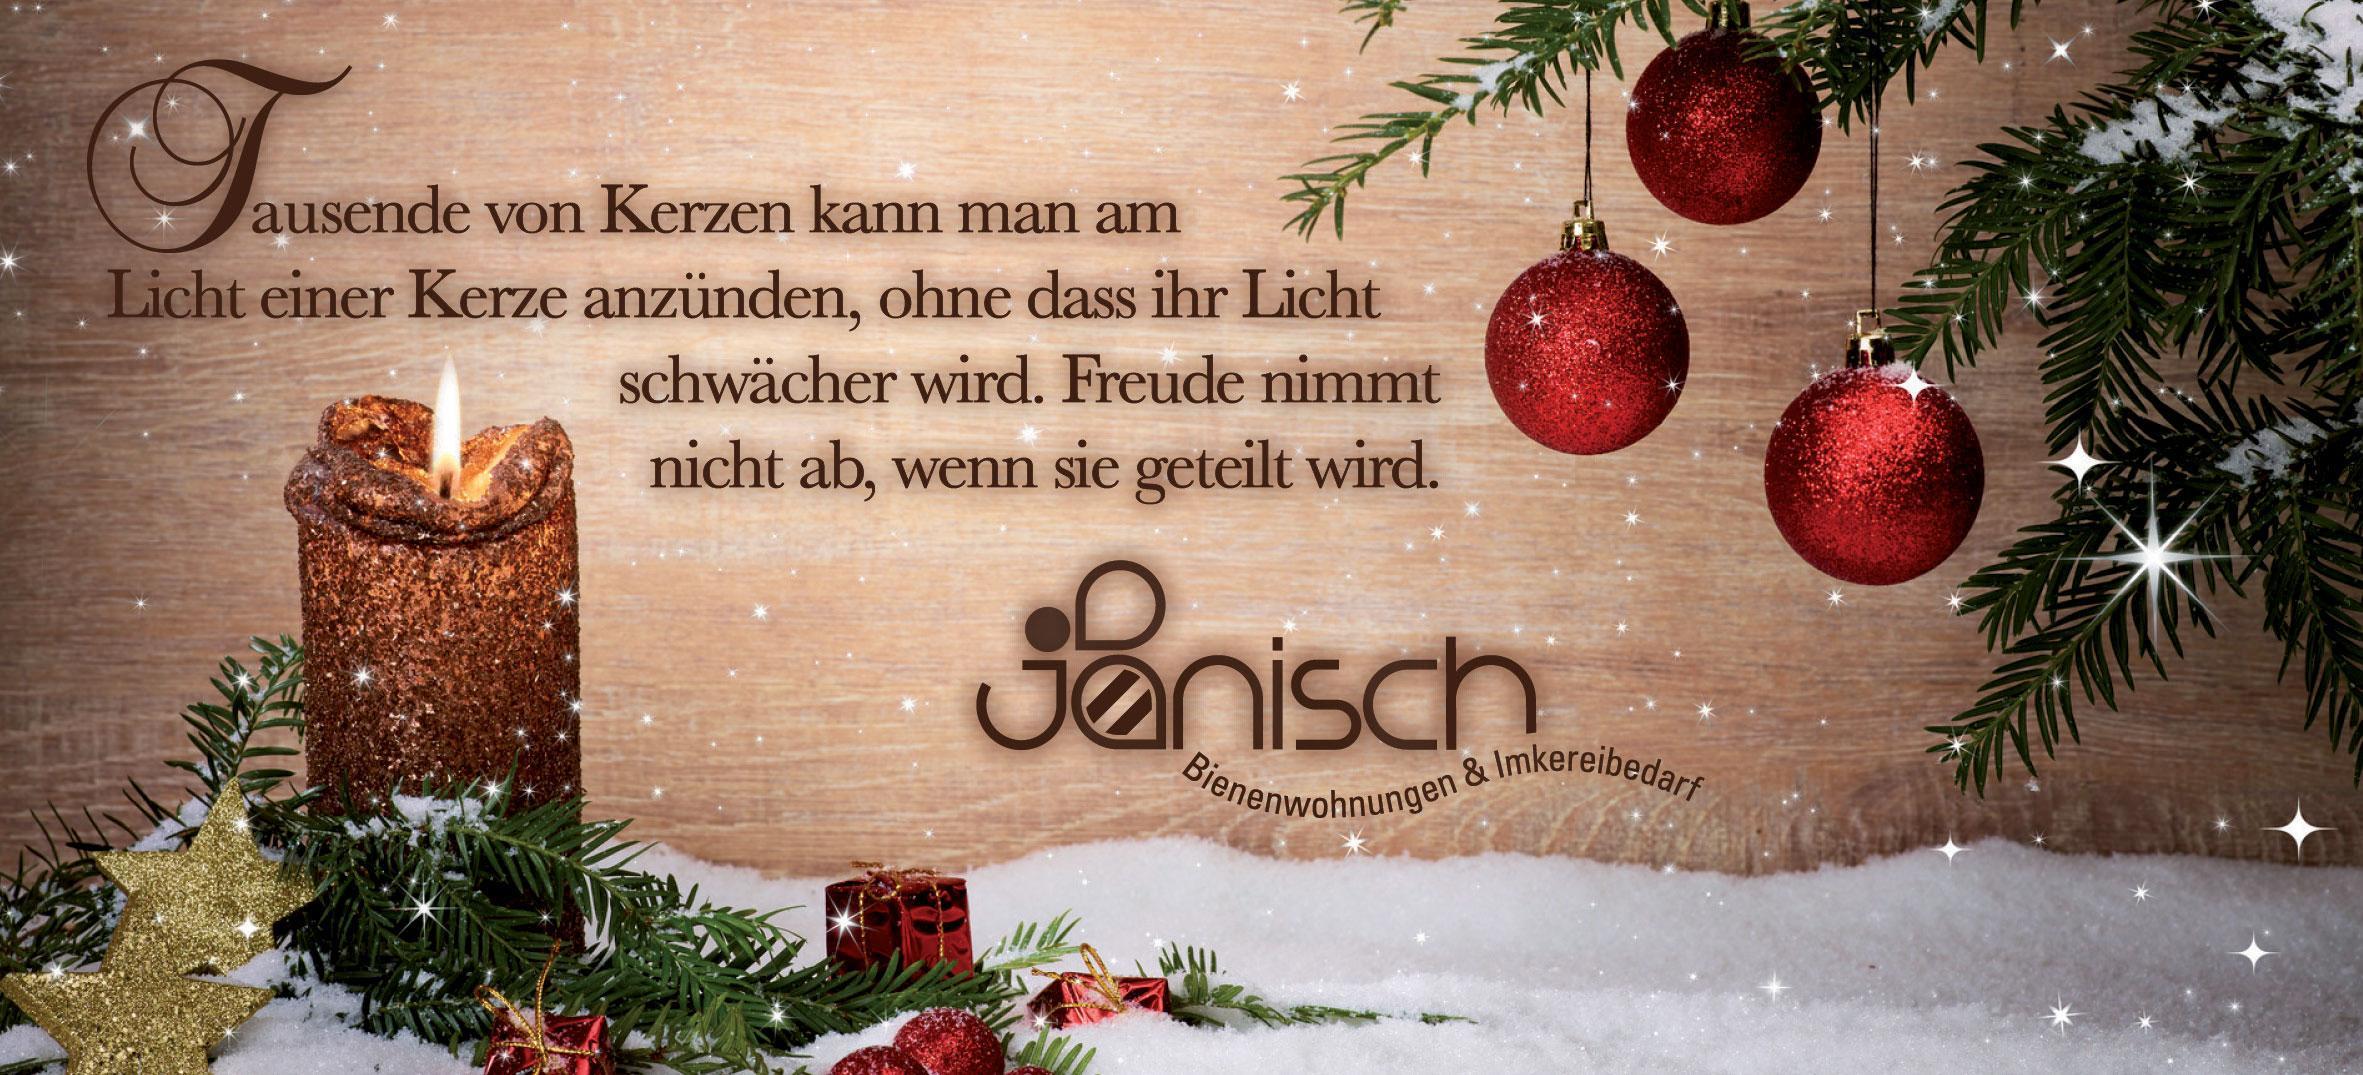 https://www.bienen-janisch.at/data/image/thumpnail/image.php?image=9/bienen_janisch_article_1520_0.jpg